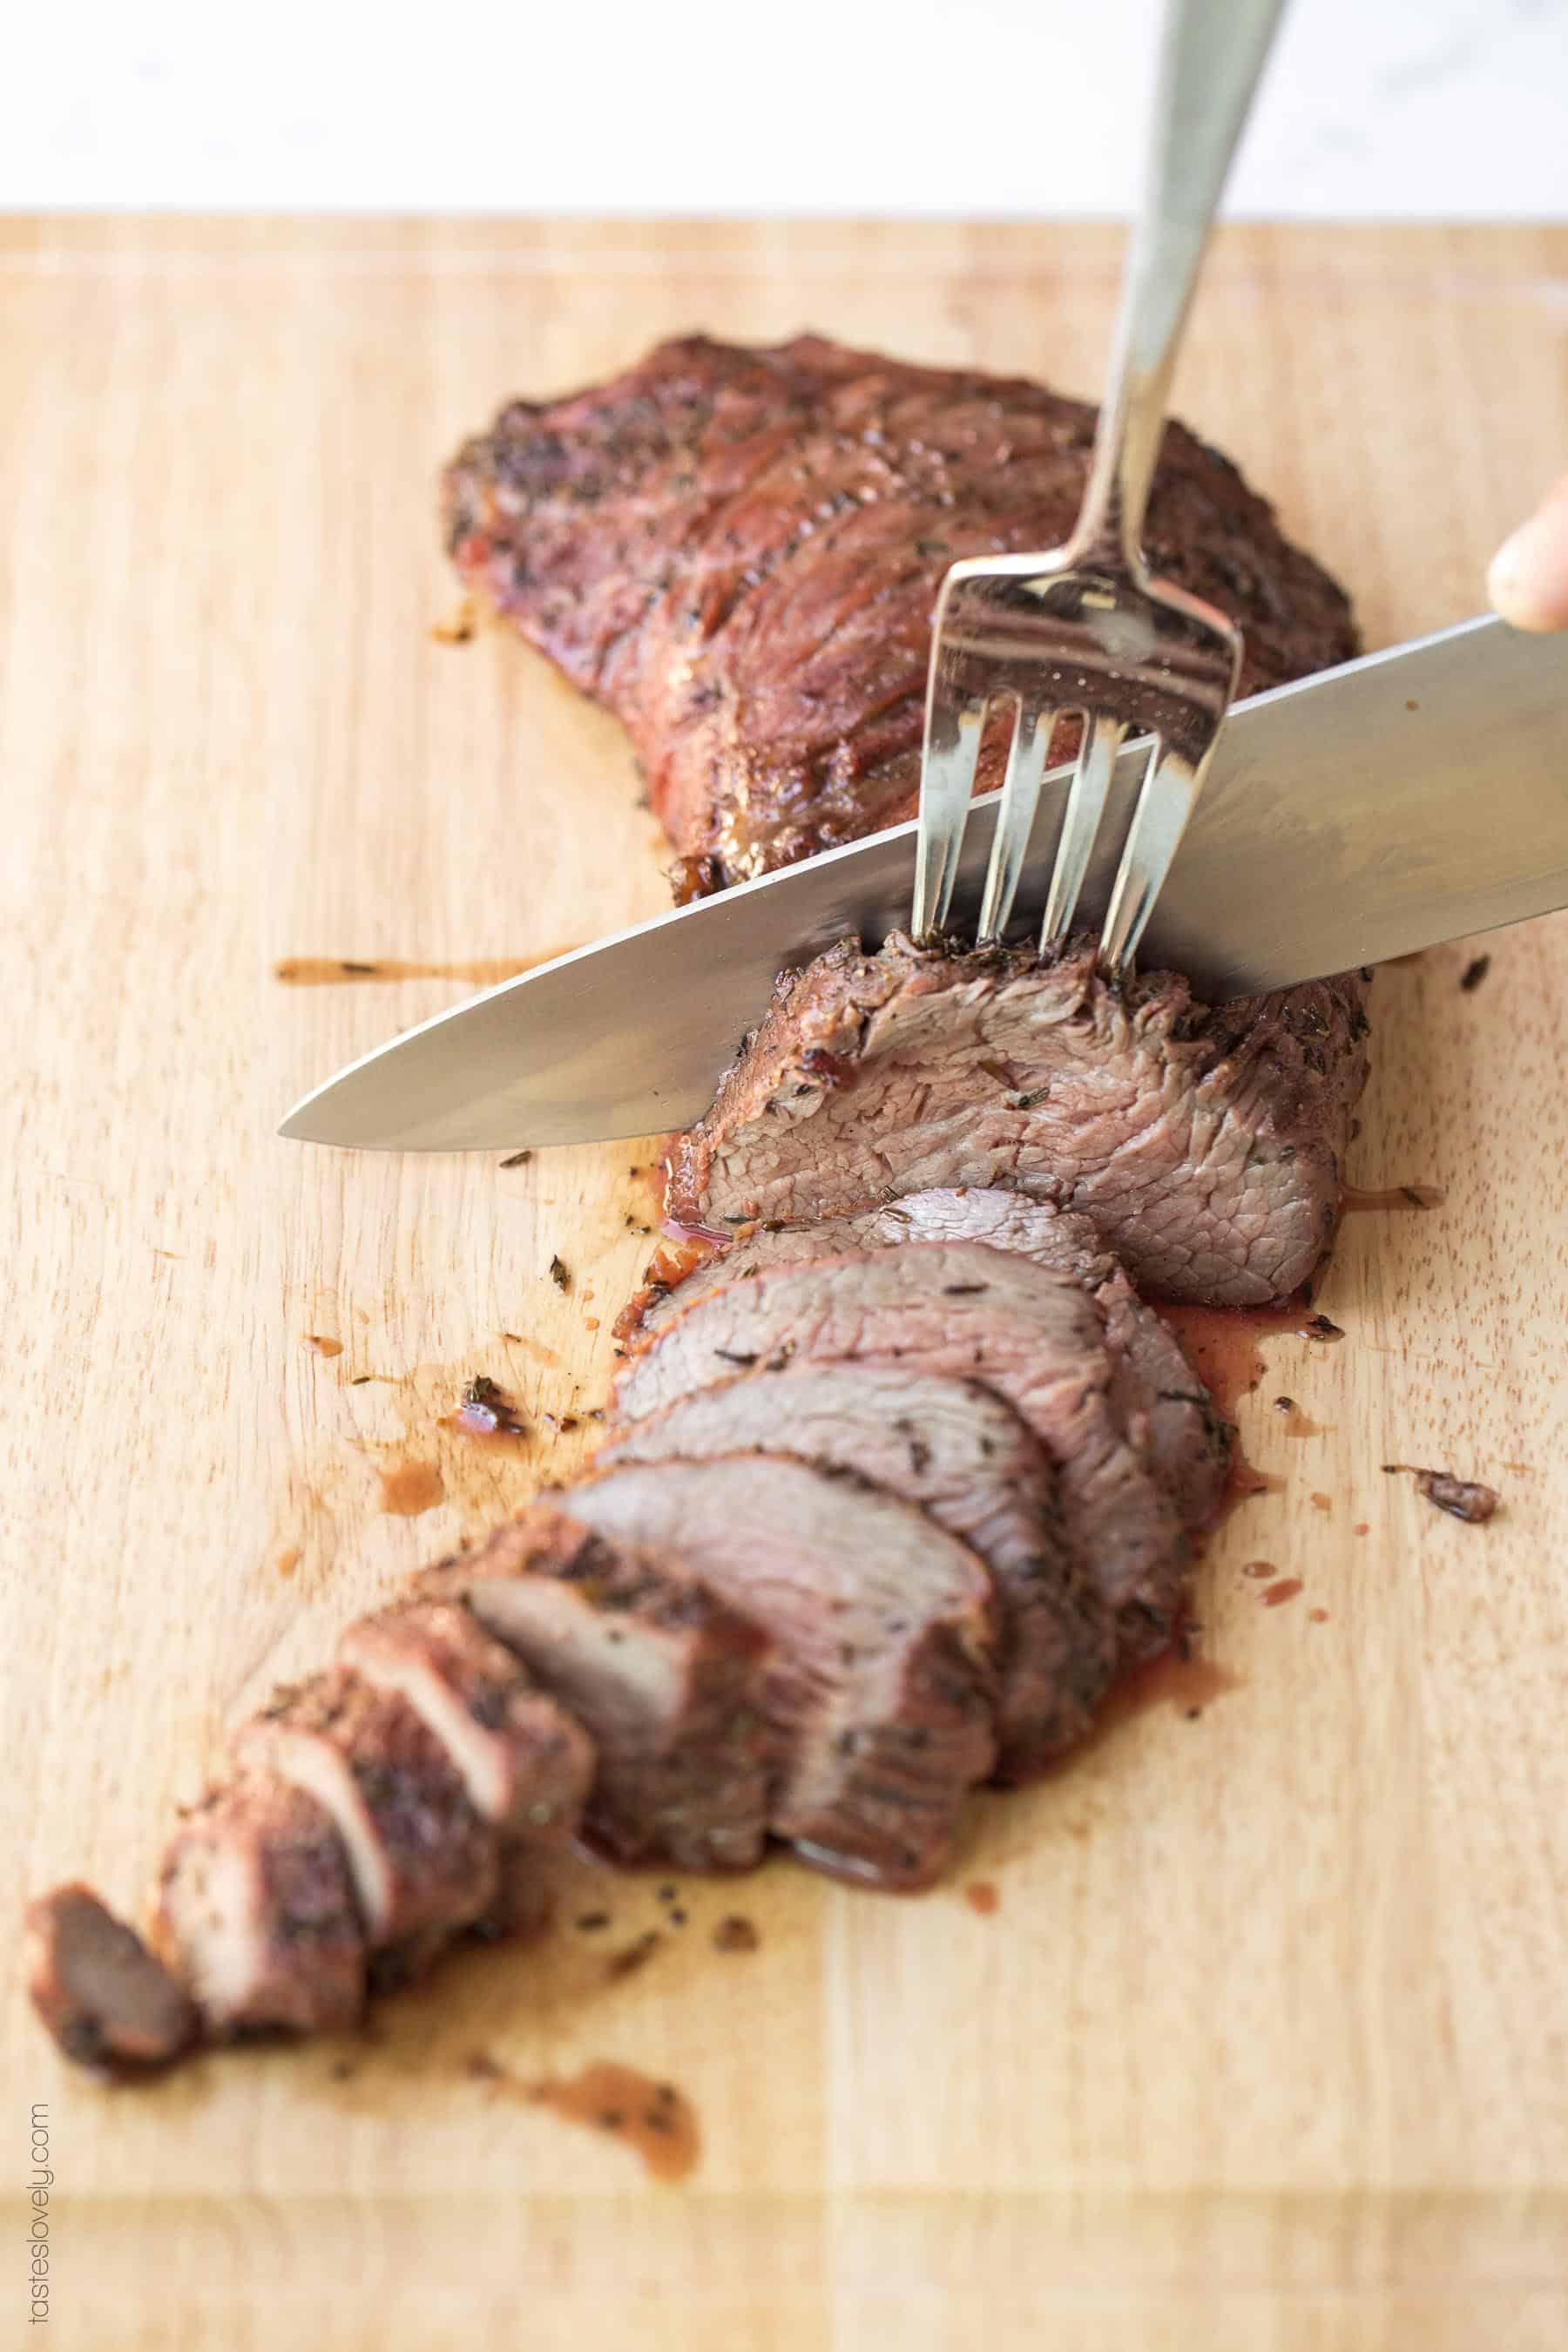 The BEST Paleo Tri Tip Steak Marinade Recipe - just 4 ingredients! Bright, flavorful and delicious. #paleo #glutenfree #grainfree #dairyfree #refinedsugarfree #cleaneating #realfood